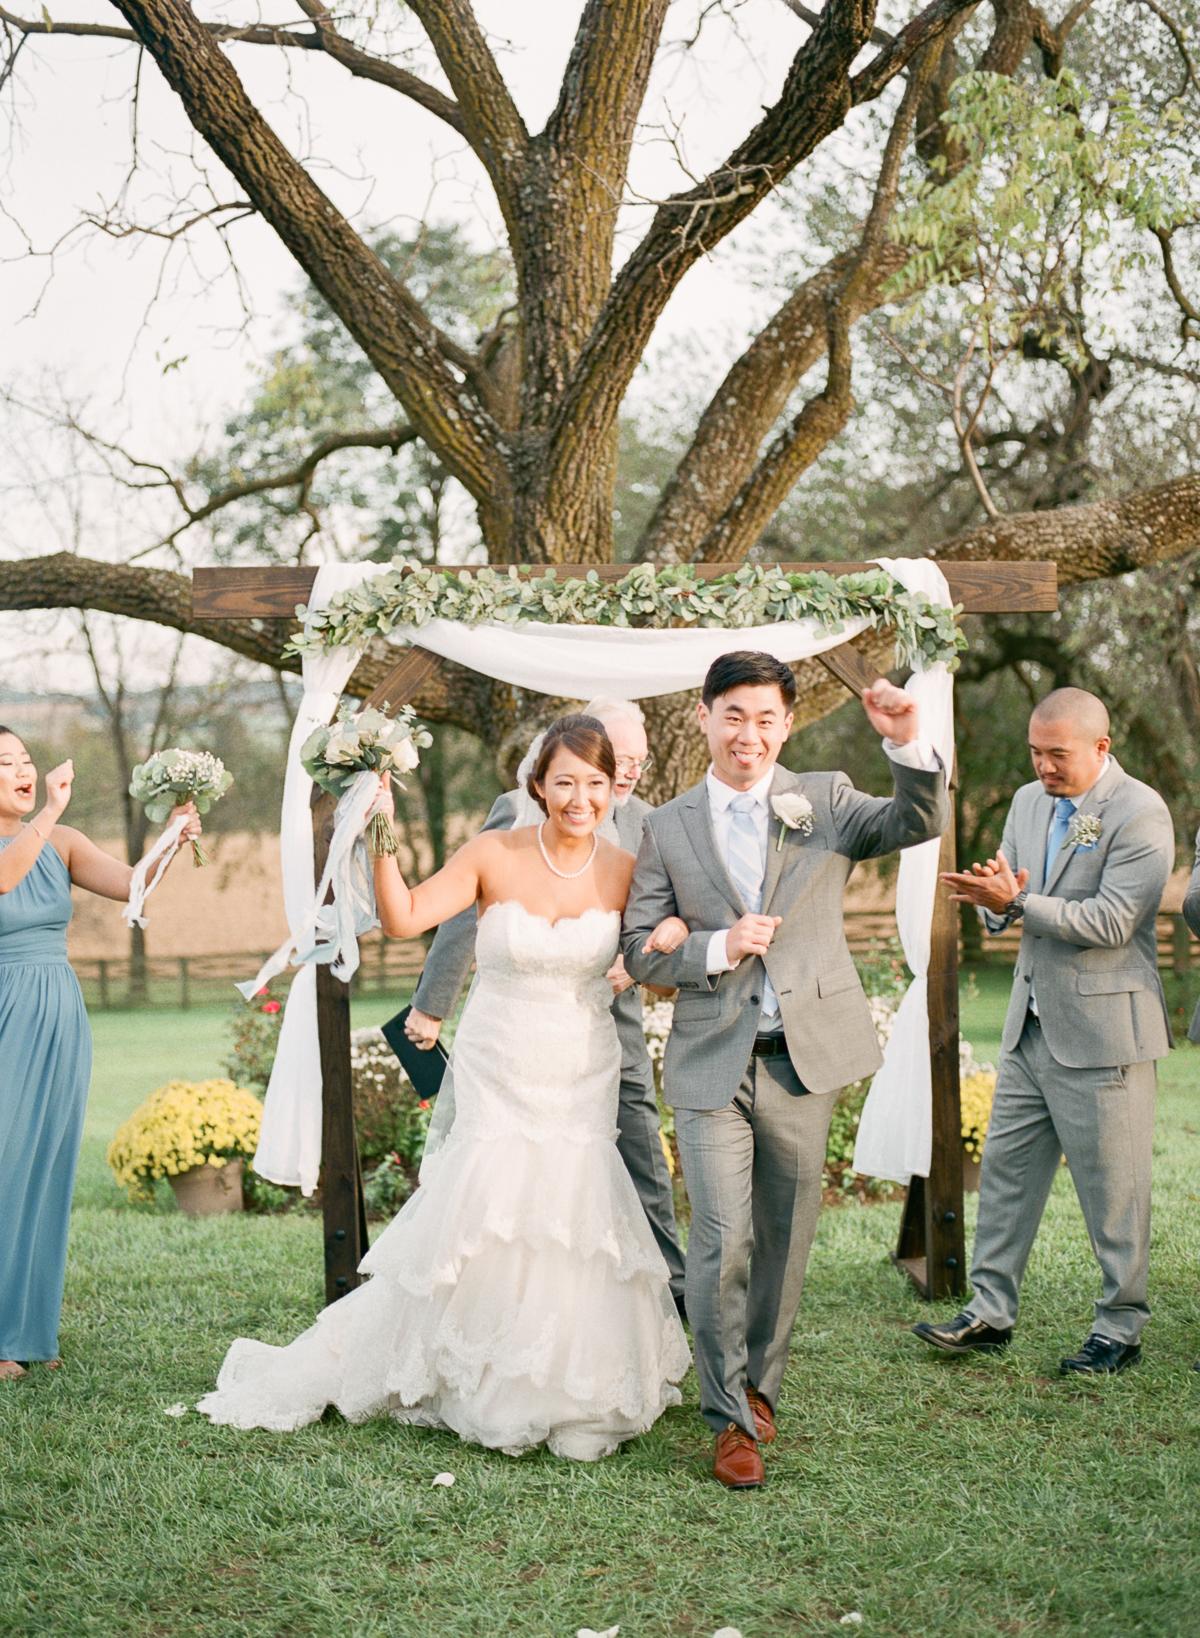 MD-Walkers-Overlook-Wedding-Bride-Get-Ready-67.jpg